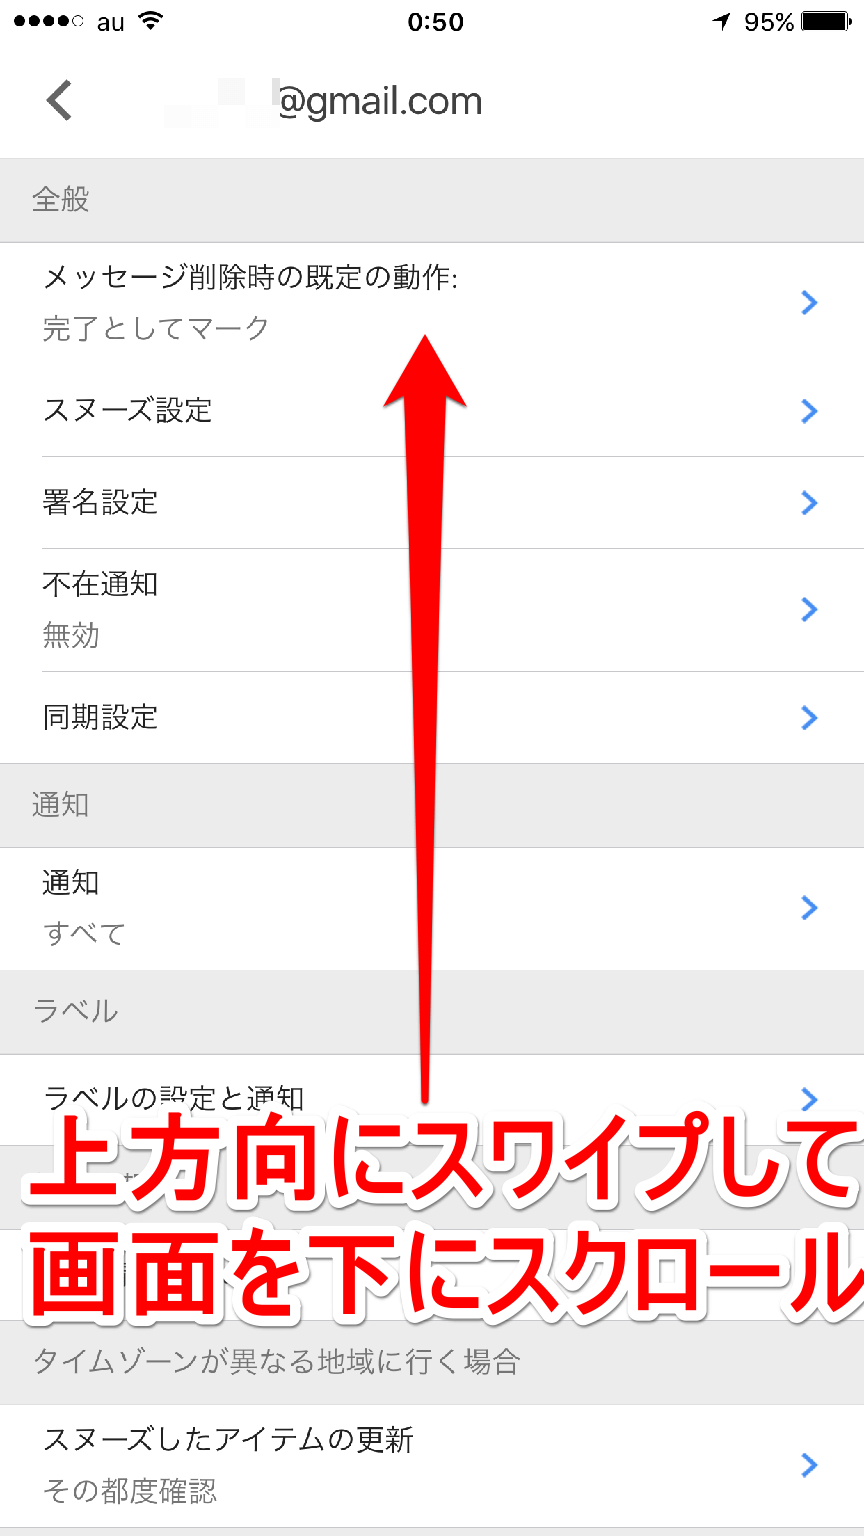 iPhone(アイフォン/アイフォーン)版Inbox(インボックス)アプリの詳細設定画面